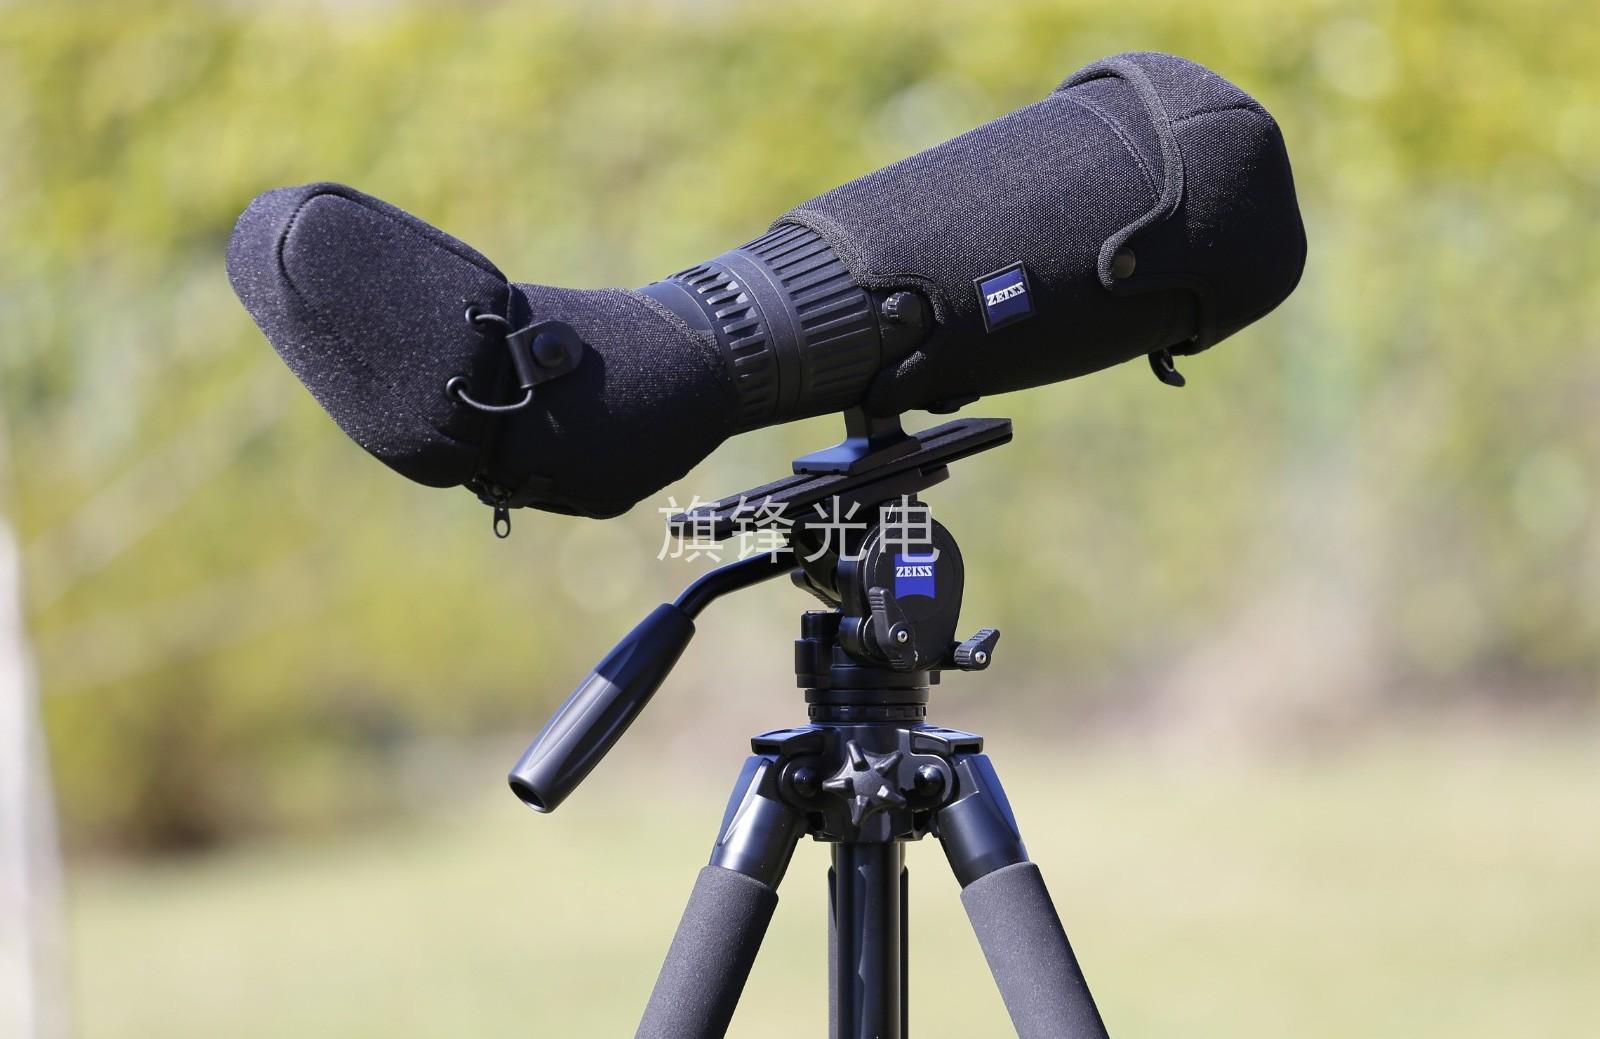 Zeiss蔡司单筒望远镜 胜利Victory Harpia 22-65x85 观鸟镜